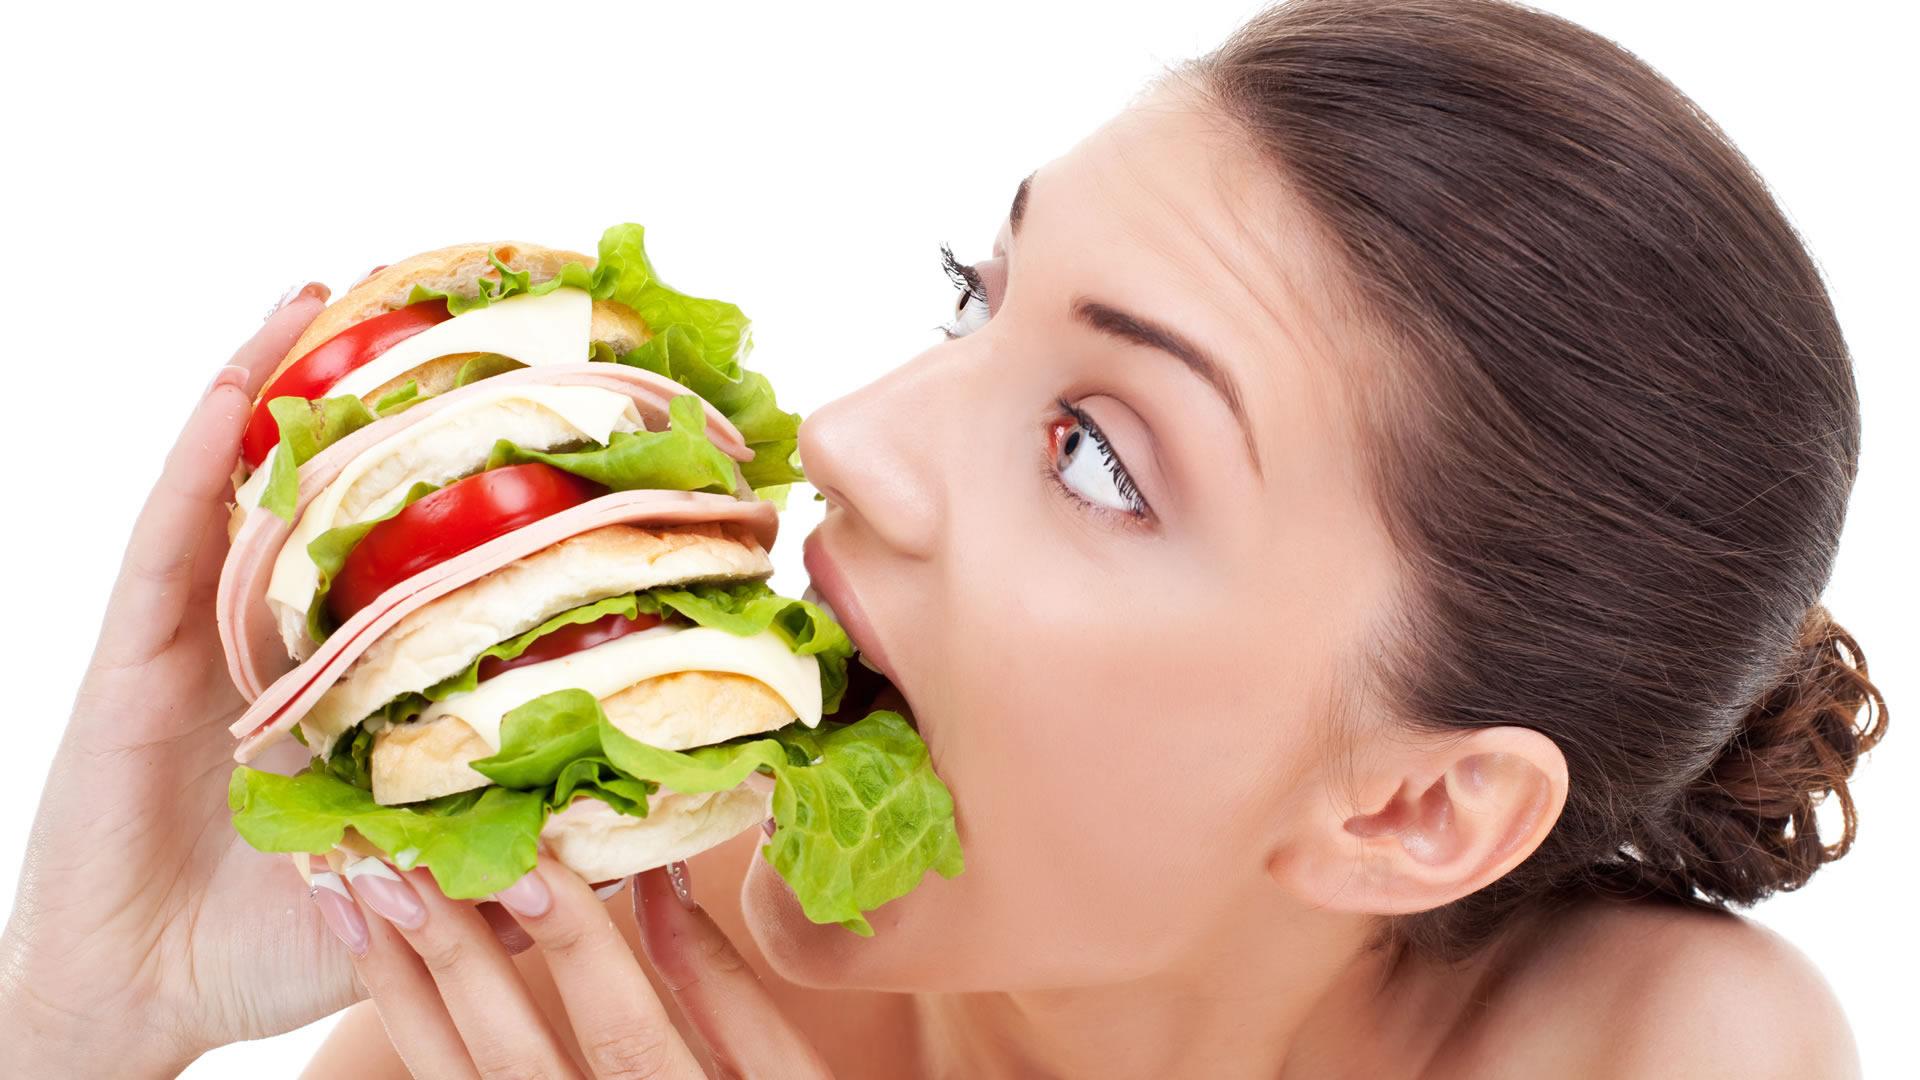 comer-deprisa-engorda